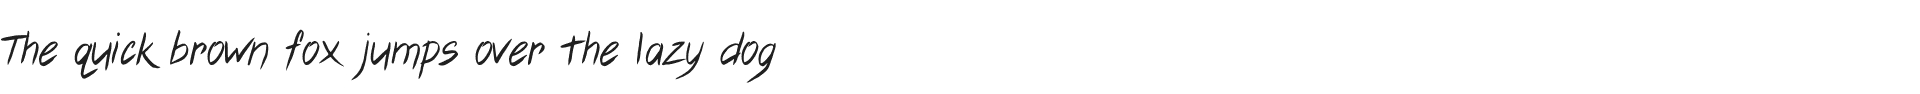 Cyclamen-Regular.otf